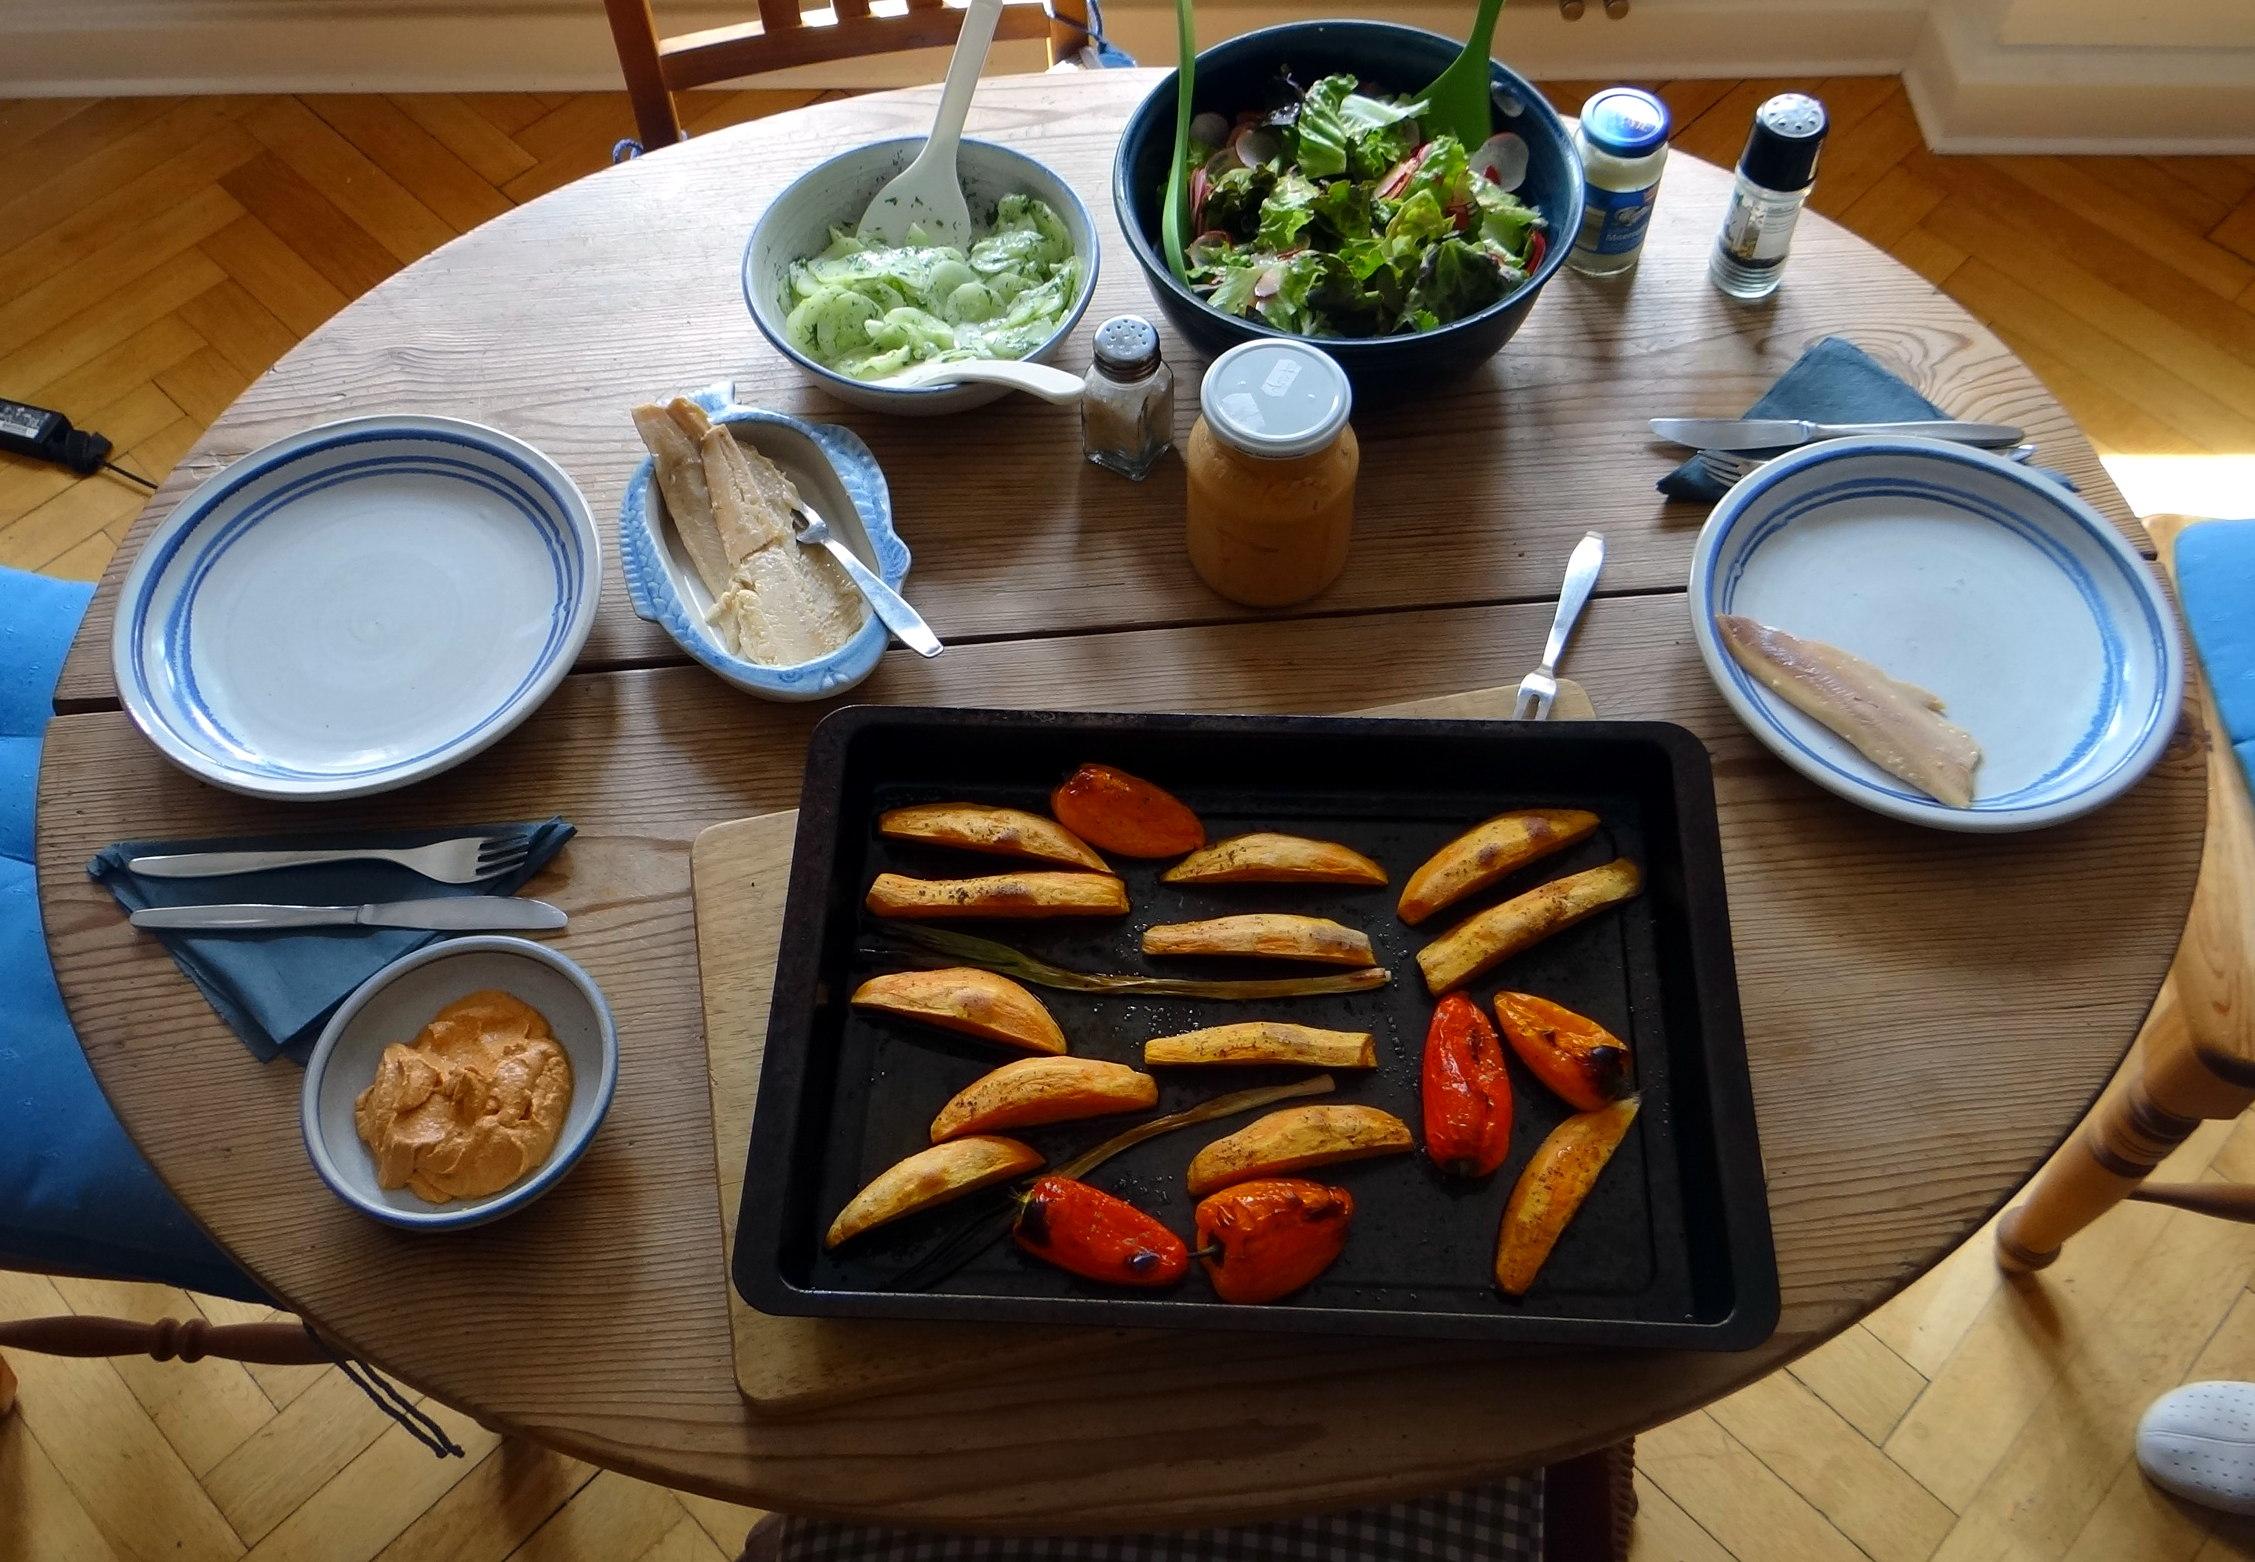 Süßkartoffel Spalten,Feta Creme,Salate (15)